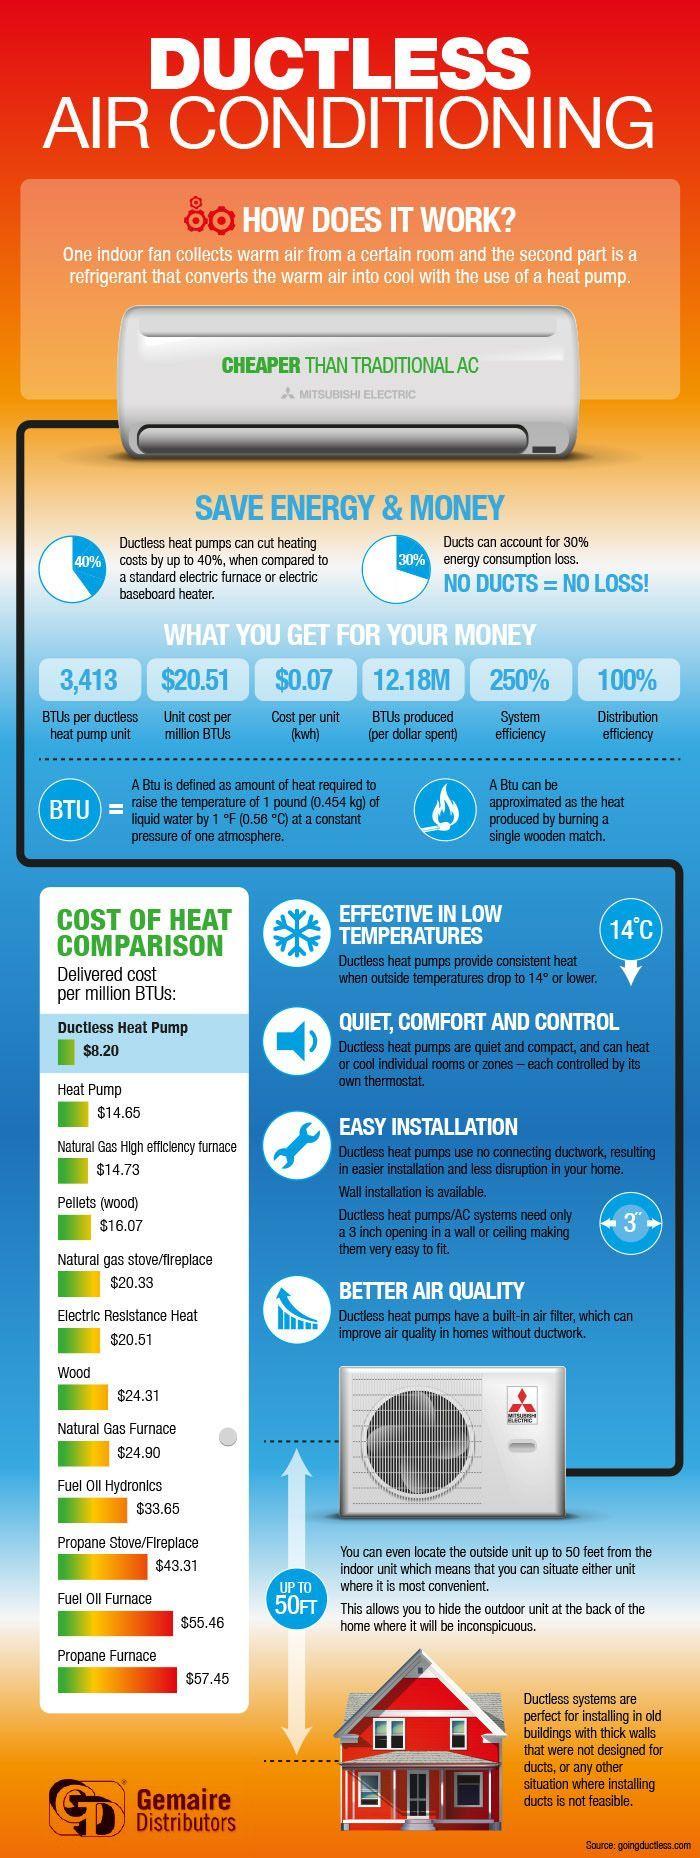 Easy air conditioning   http://www.ebay.com/itm/282028615192?ssPageName=STRK:MESELX:IT